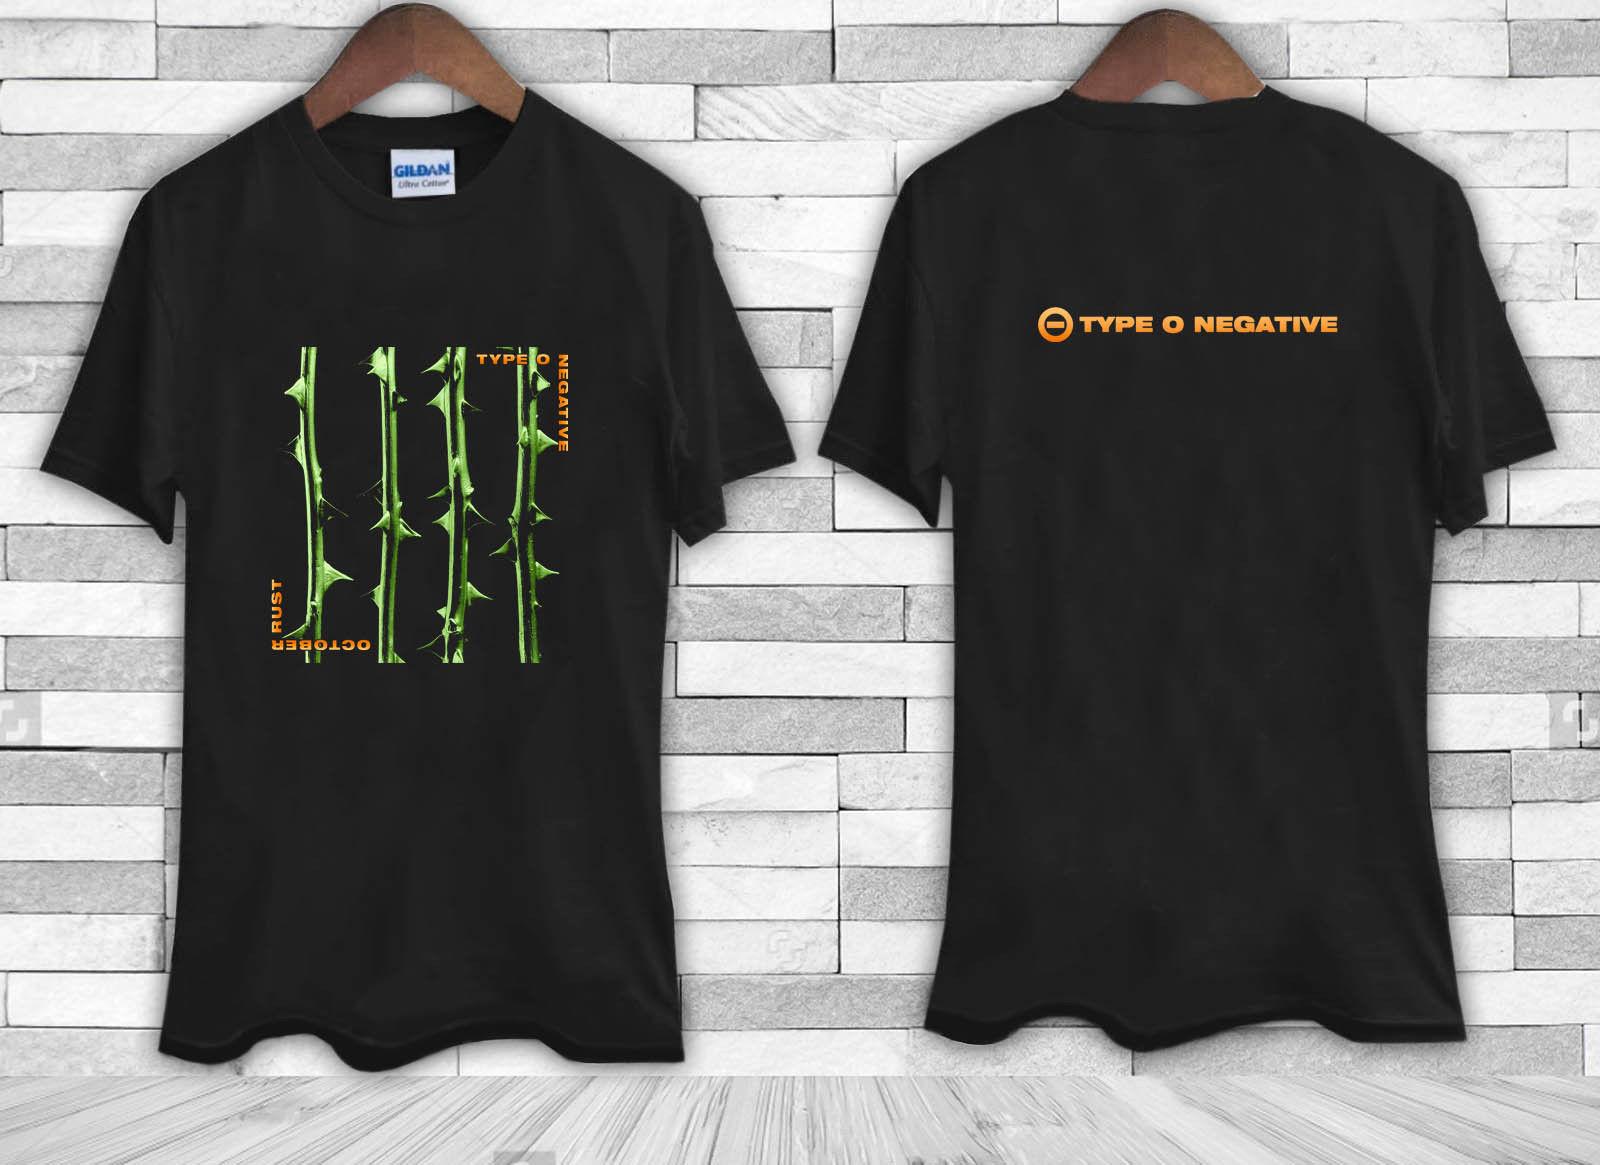 Shirt design types - Gildan New Type O Negative October Rust Men S Tee Shirt Tshirt China Mainland